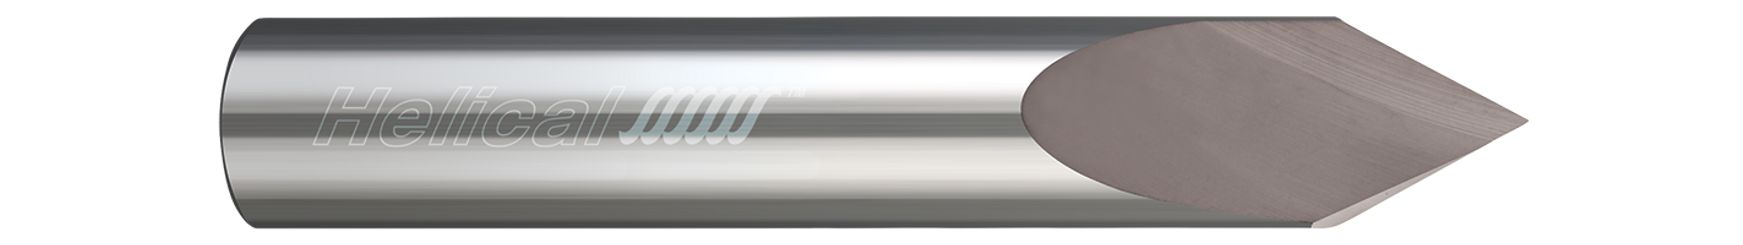 tool-details-06255